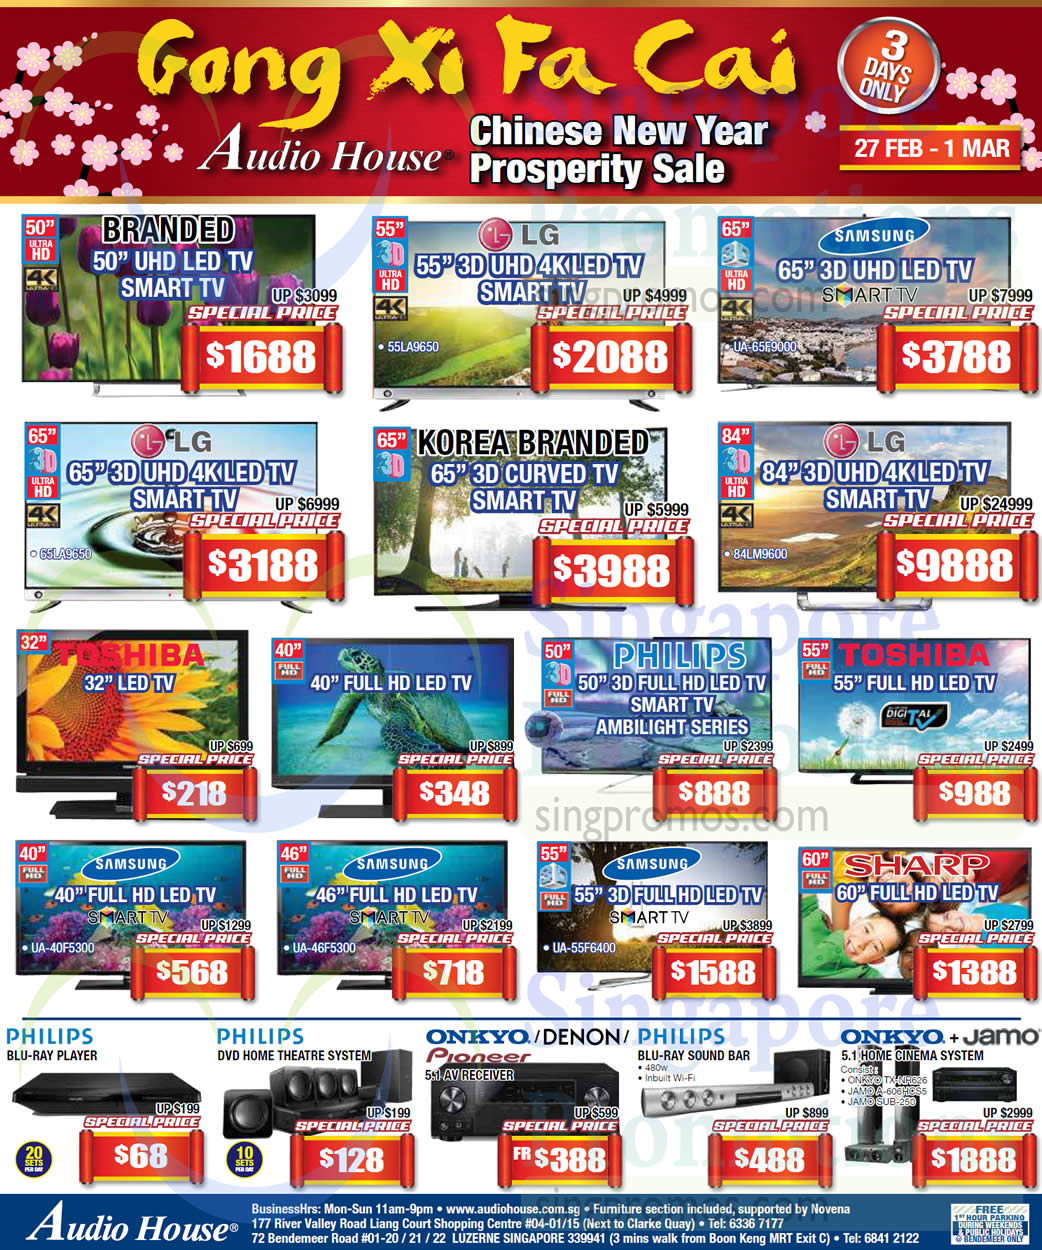 LG 55LA9650 TV, Samsung UA65F9000 TV, LG 65LA9650 TV, LG 84LM9600 TV, Samsung UA40F5300 TV, Samsung UA46F5300 TV, Samsung UA55F6400 TV